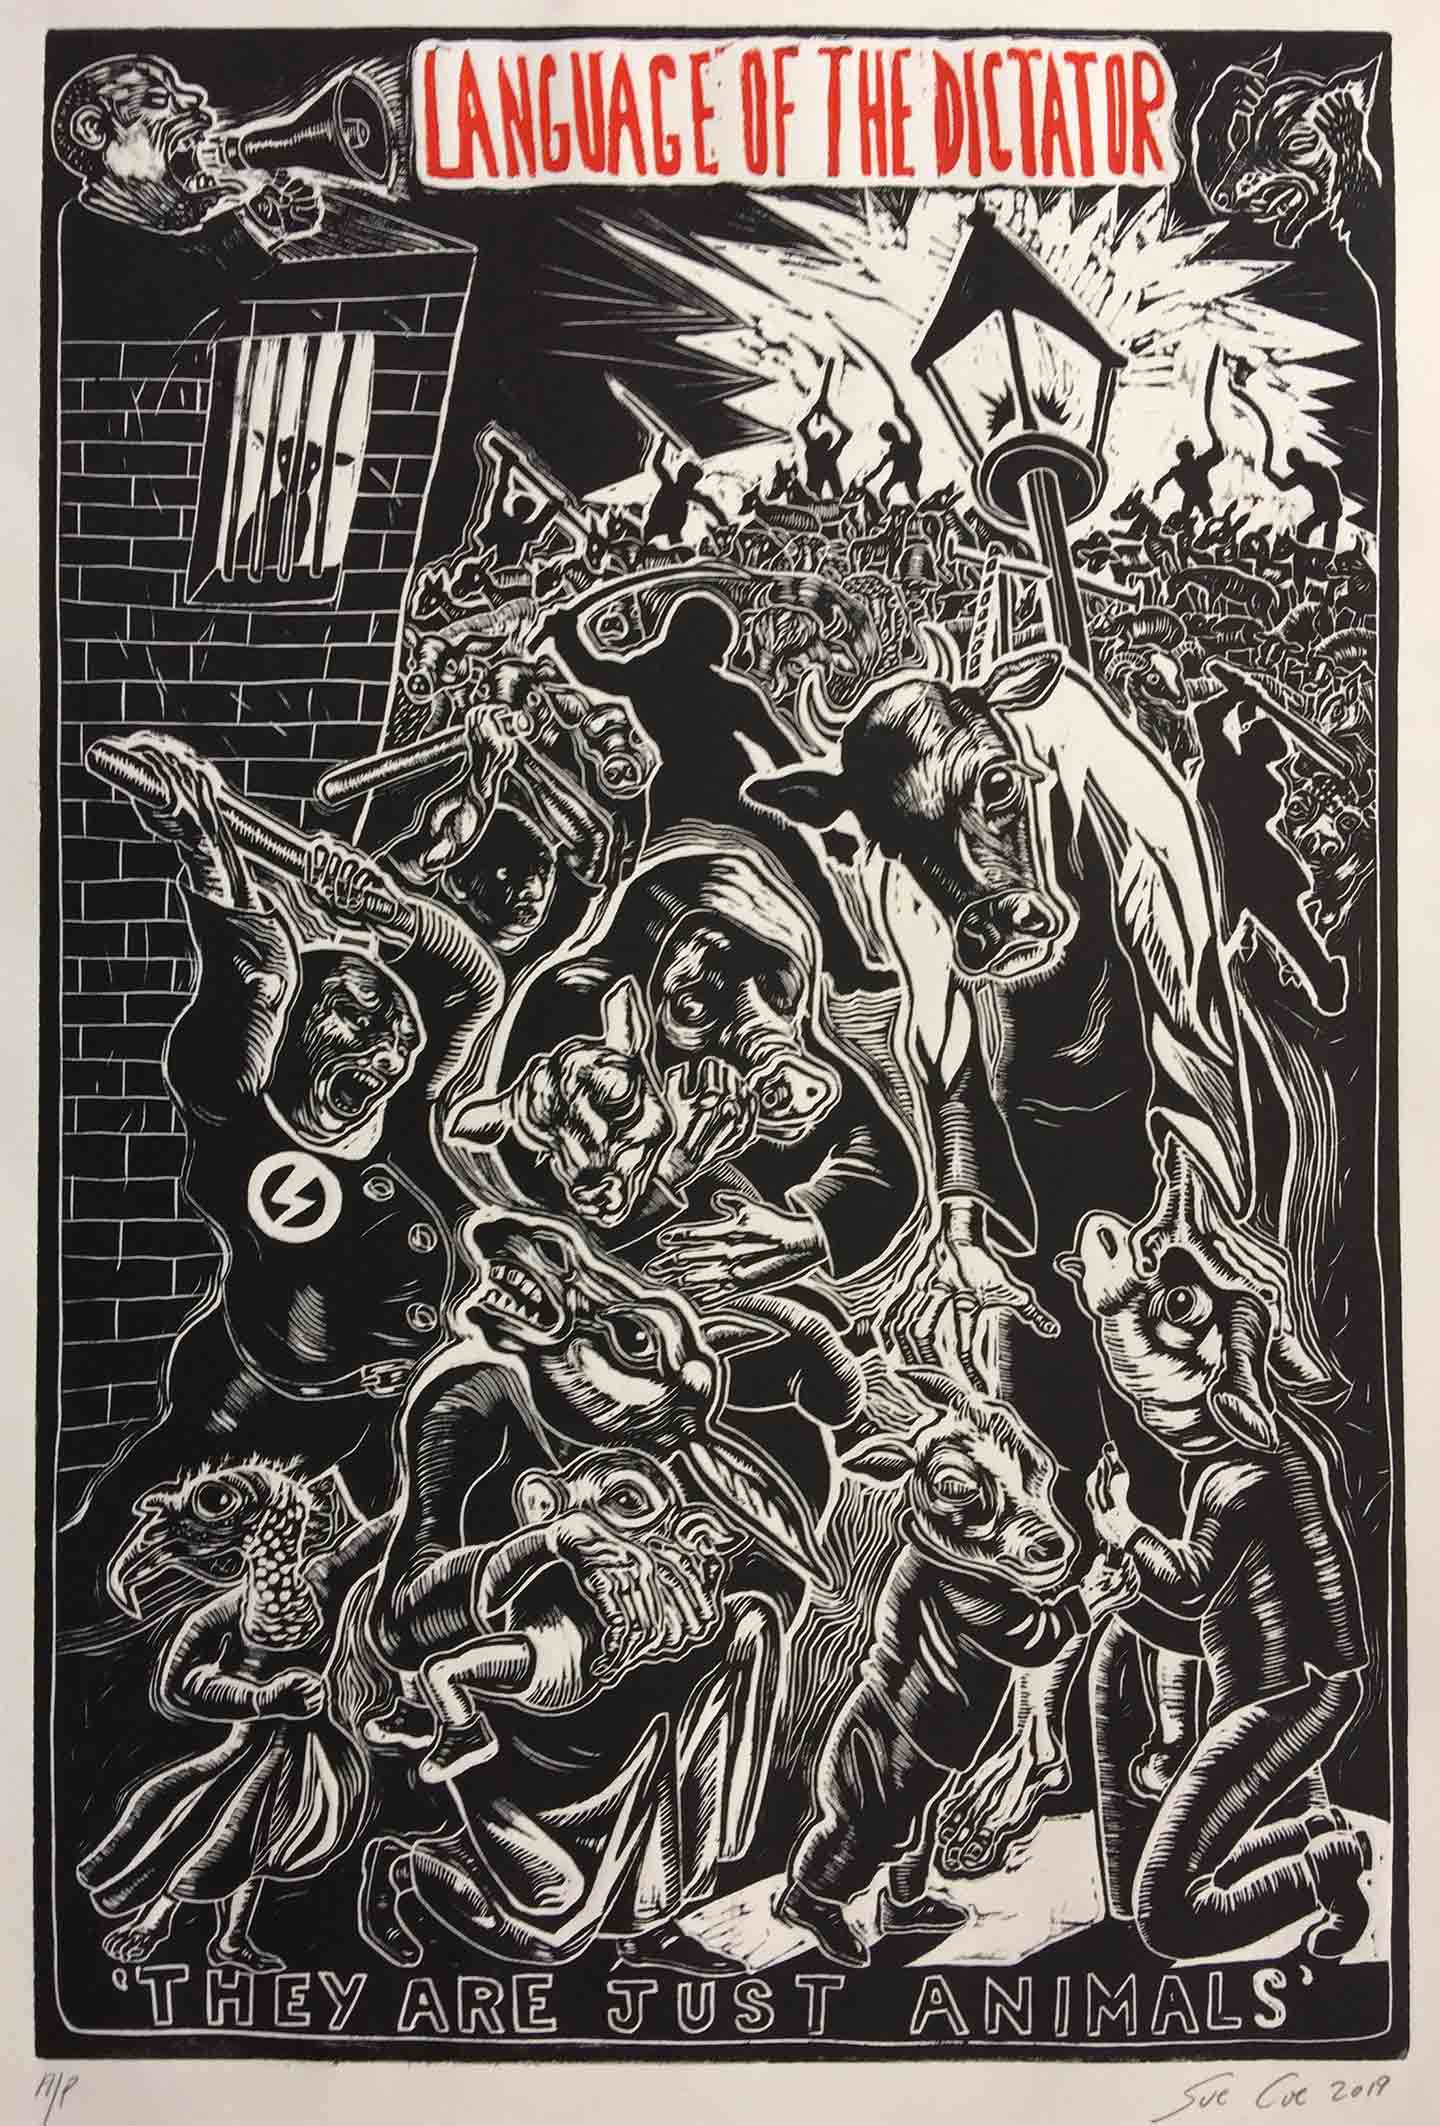 Sue Coe's illustration of animals being tortured.